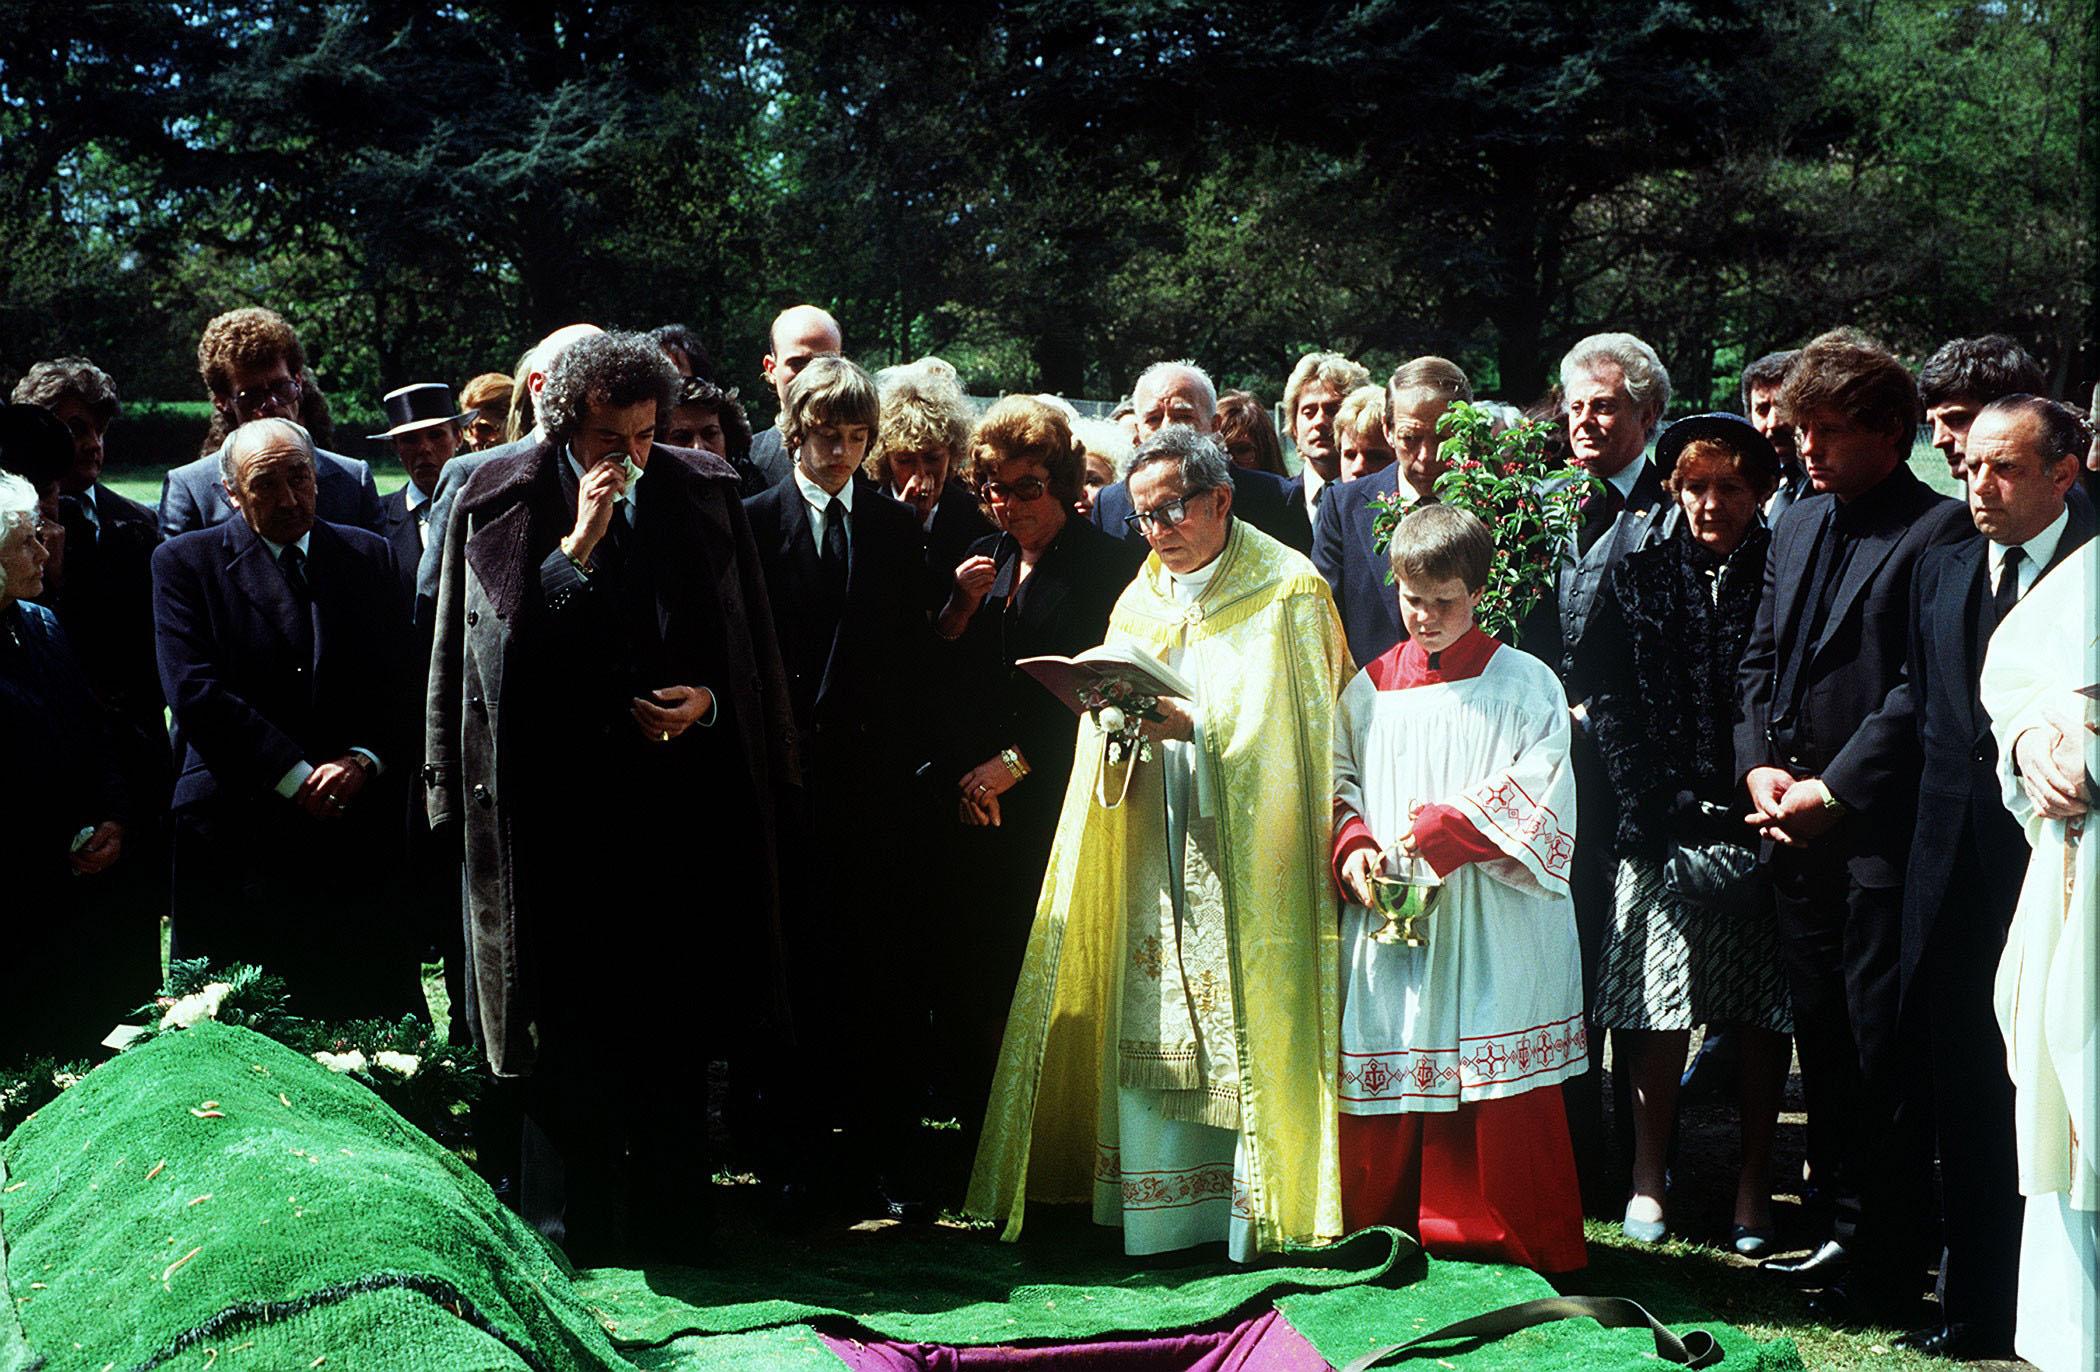 diana-dors-funeral.jpg